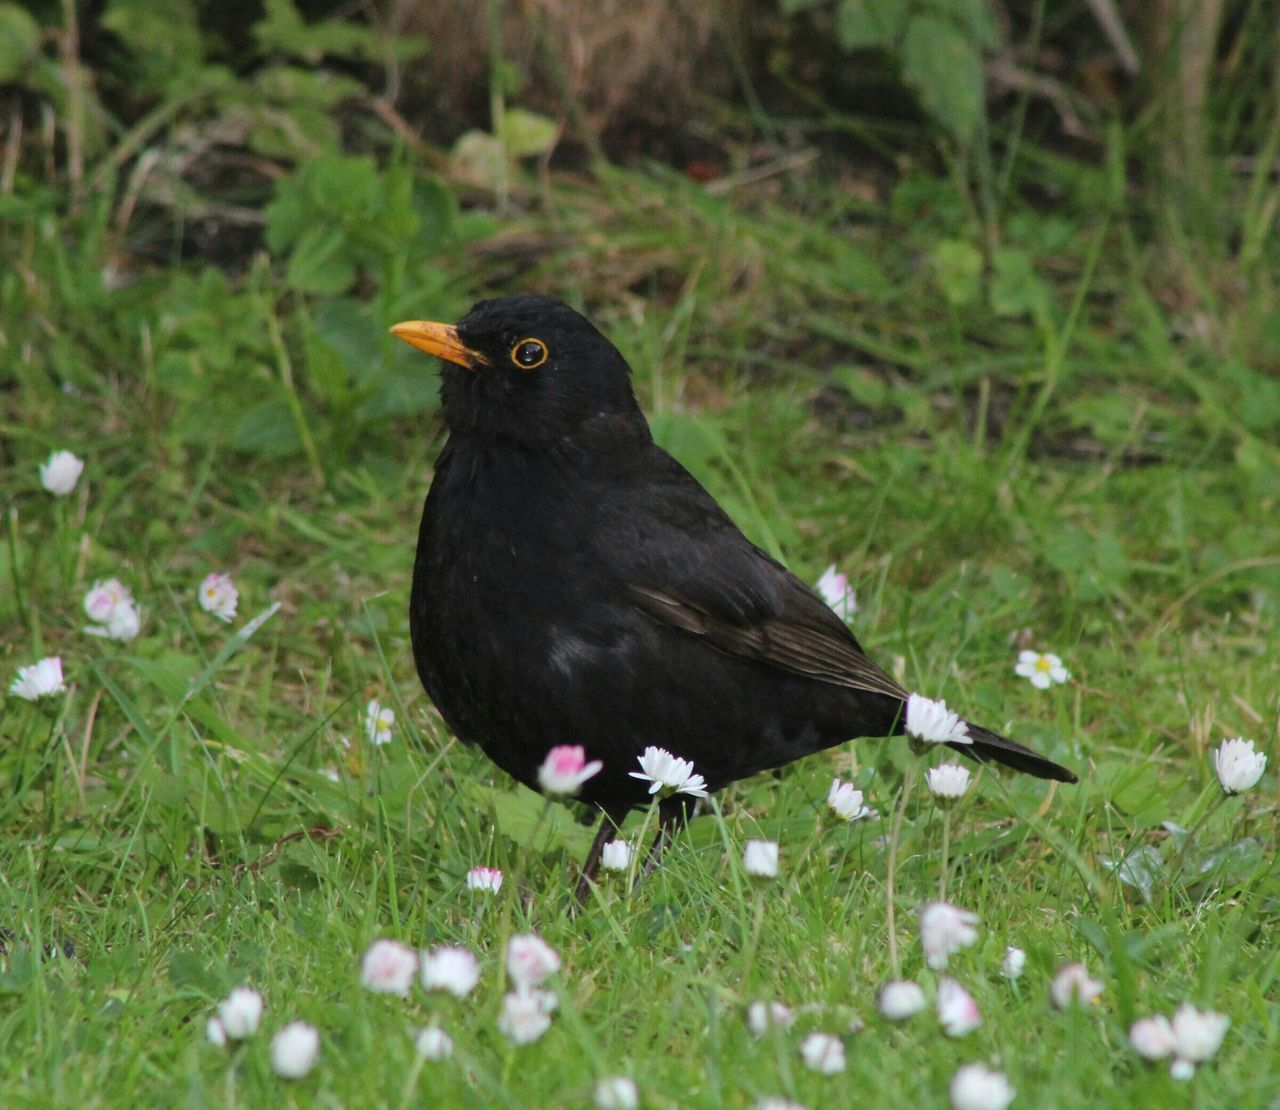 Close-Up Of Common Blackbird Perching Amidst Fresh Daisies